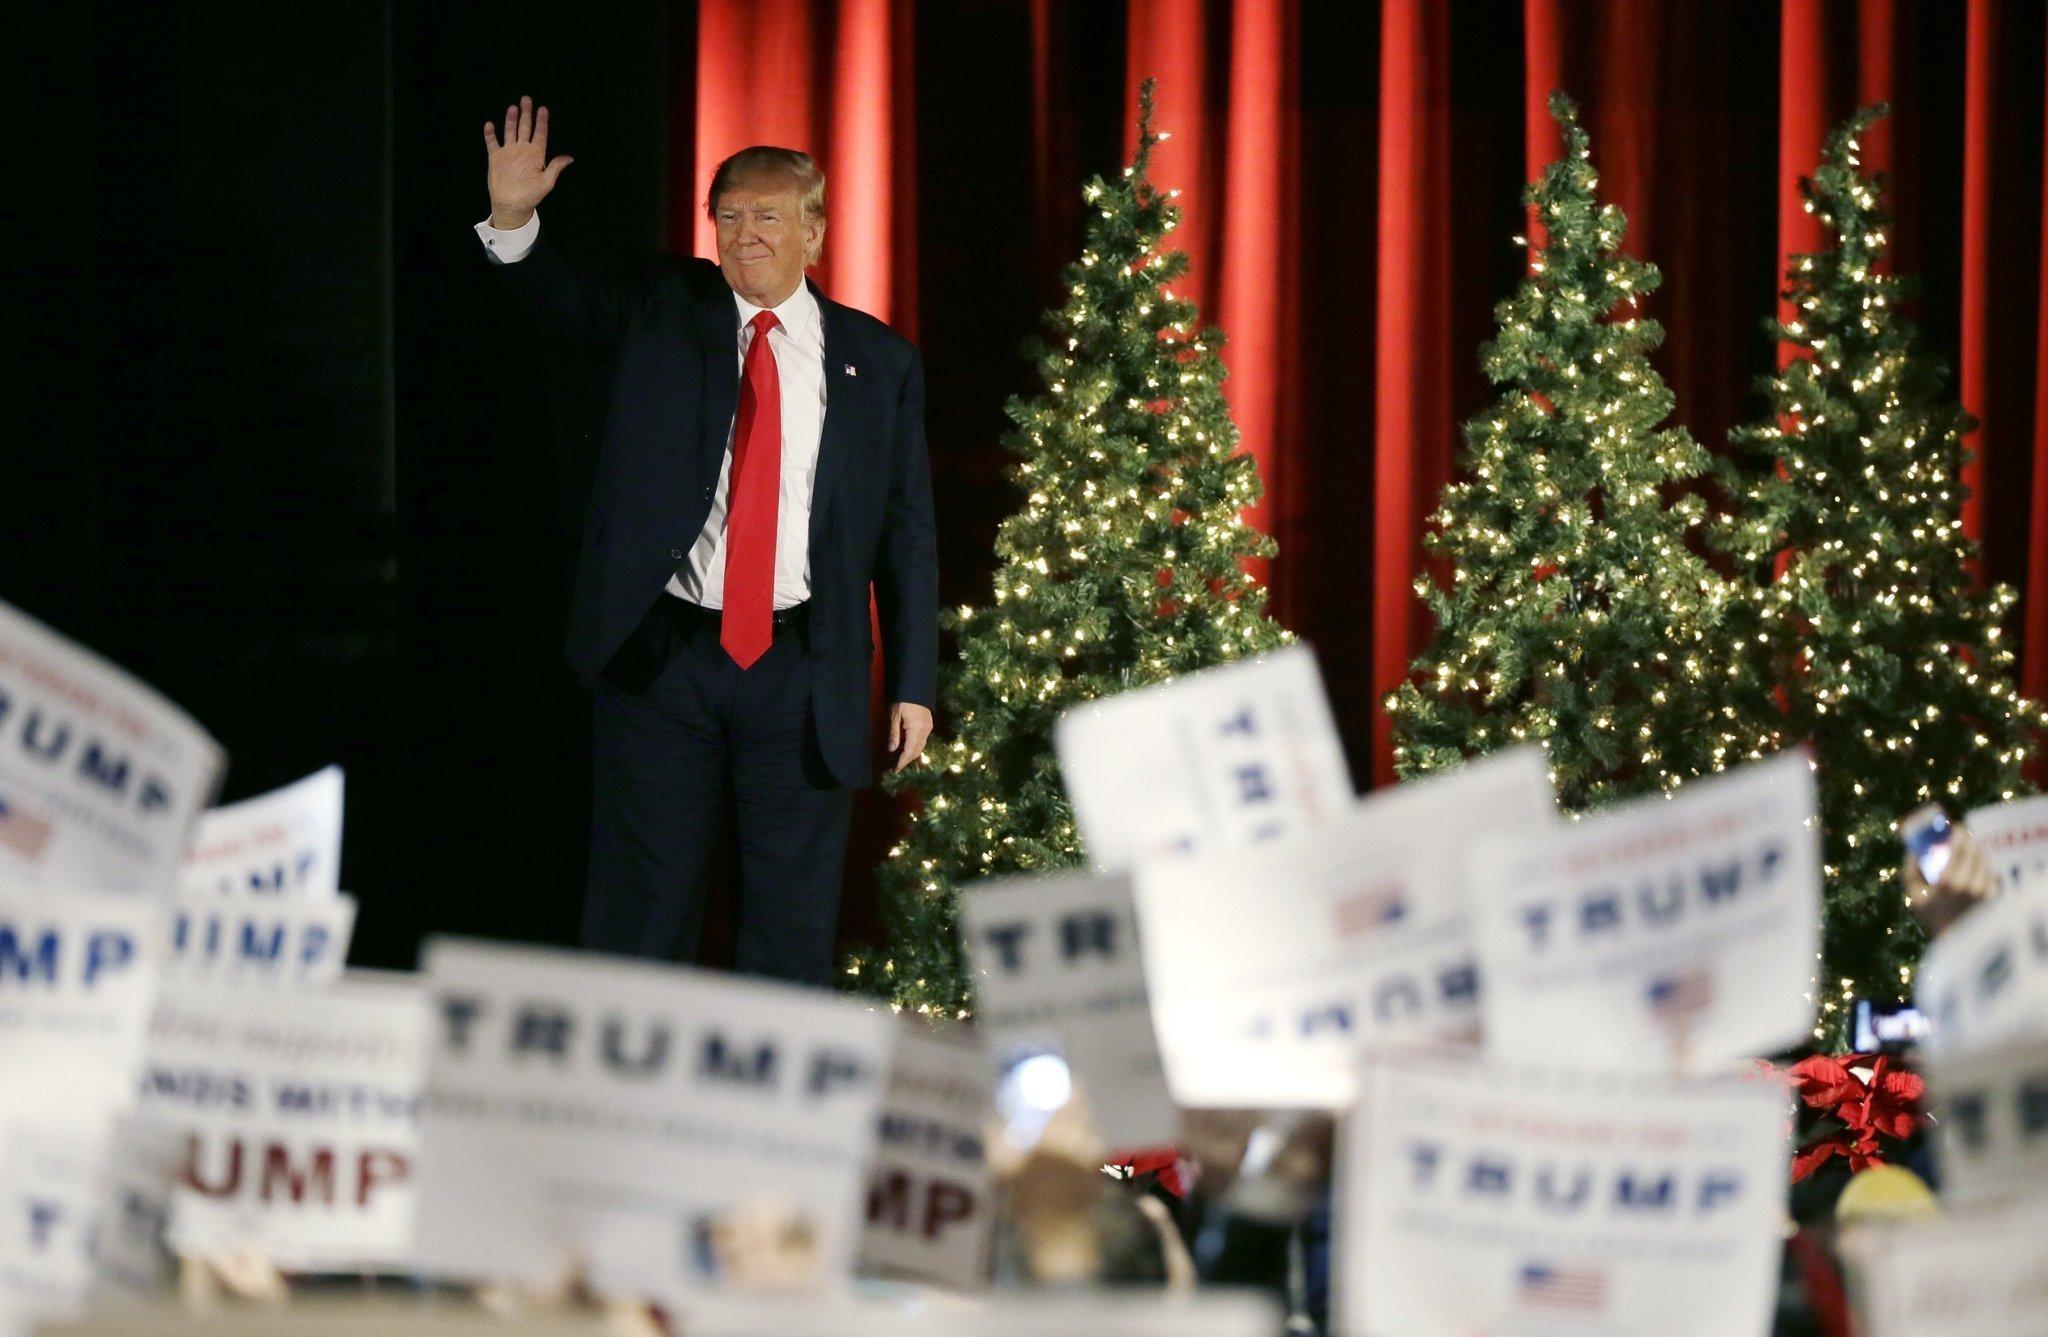 New Christmas song lyrics for the post-Trump holiday | Opinion - Sun ...